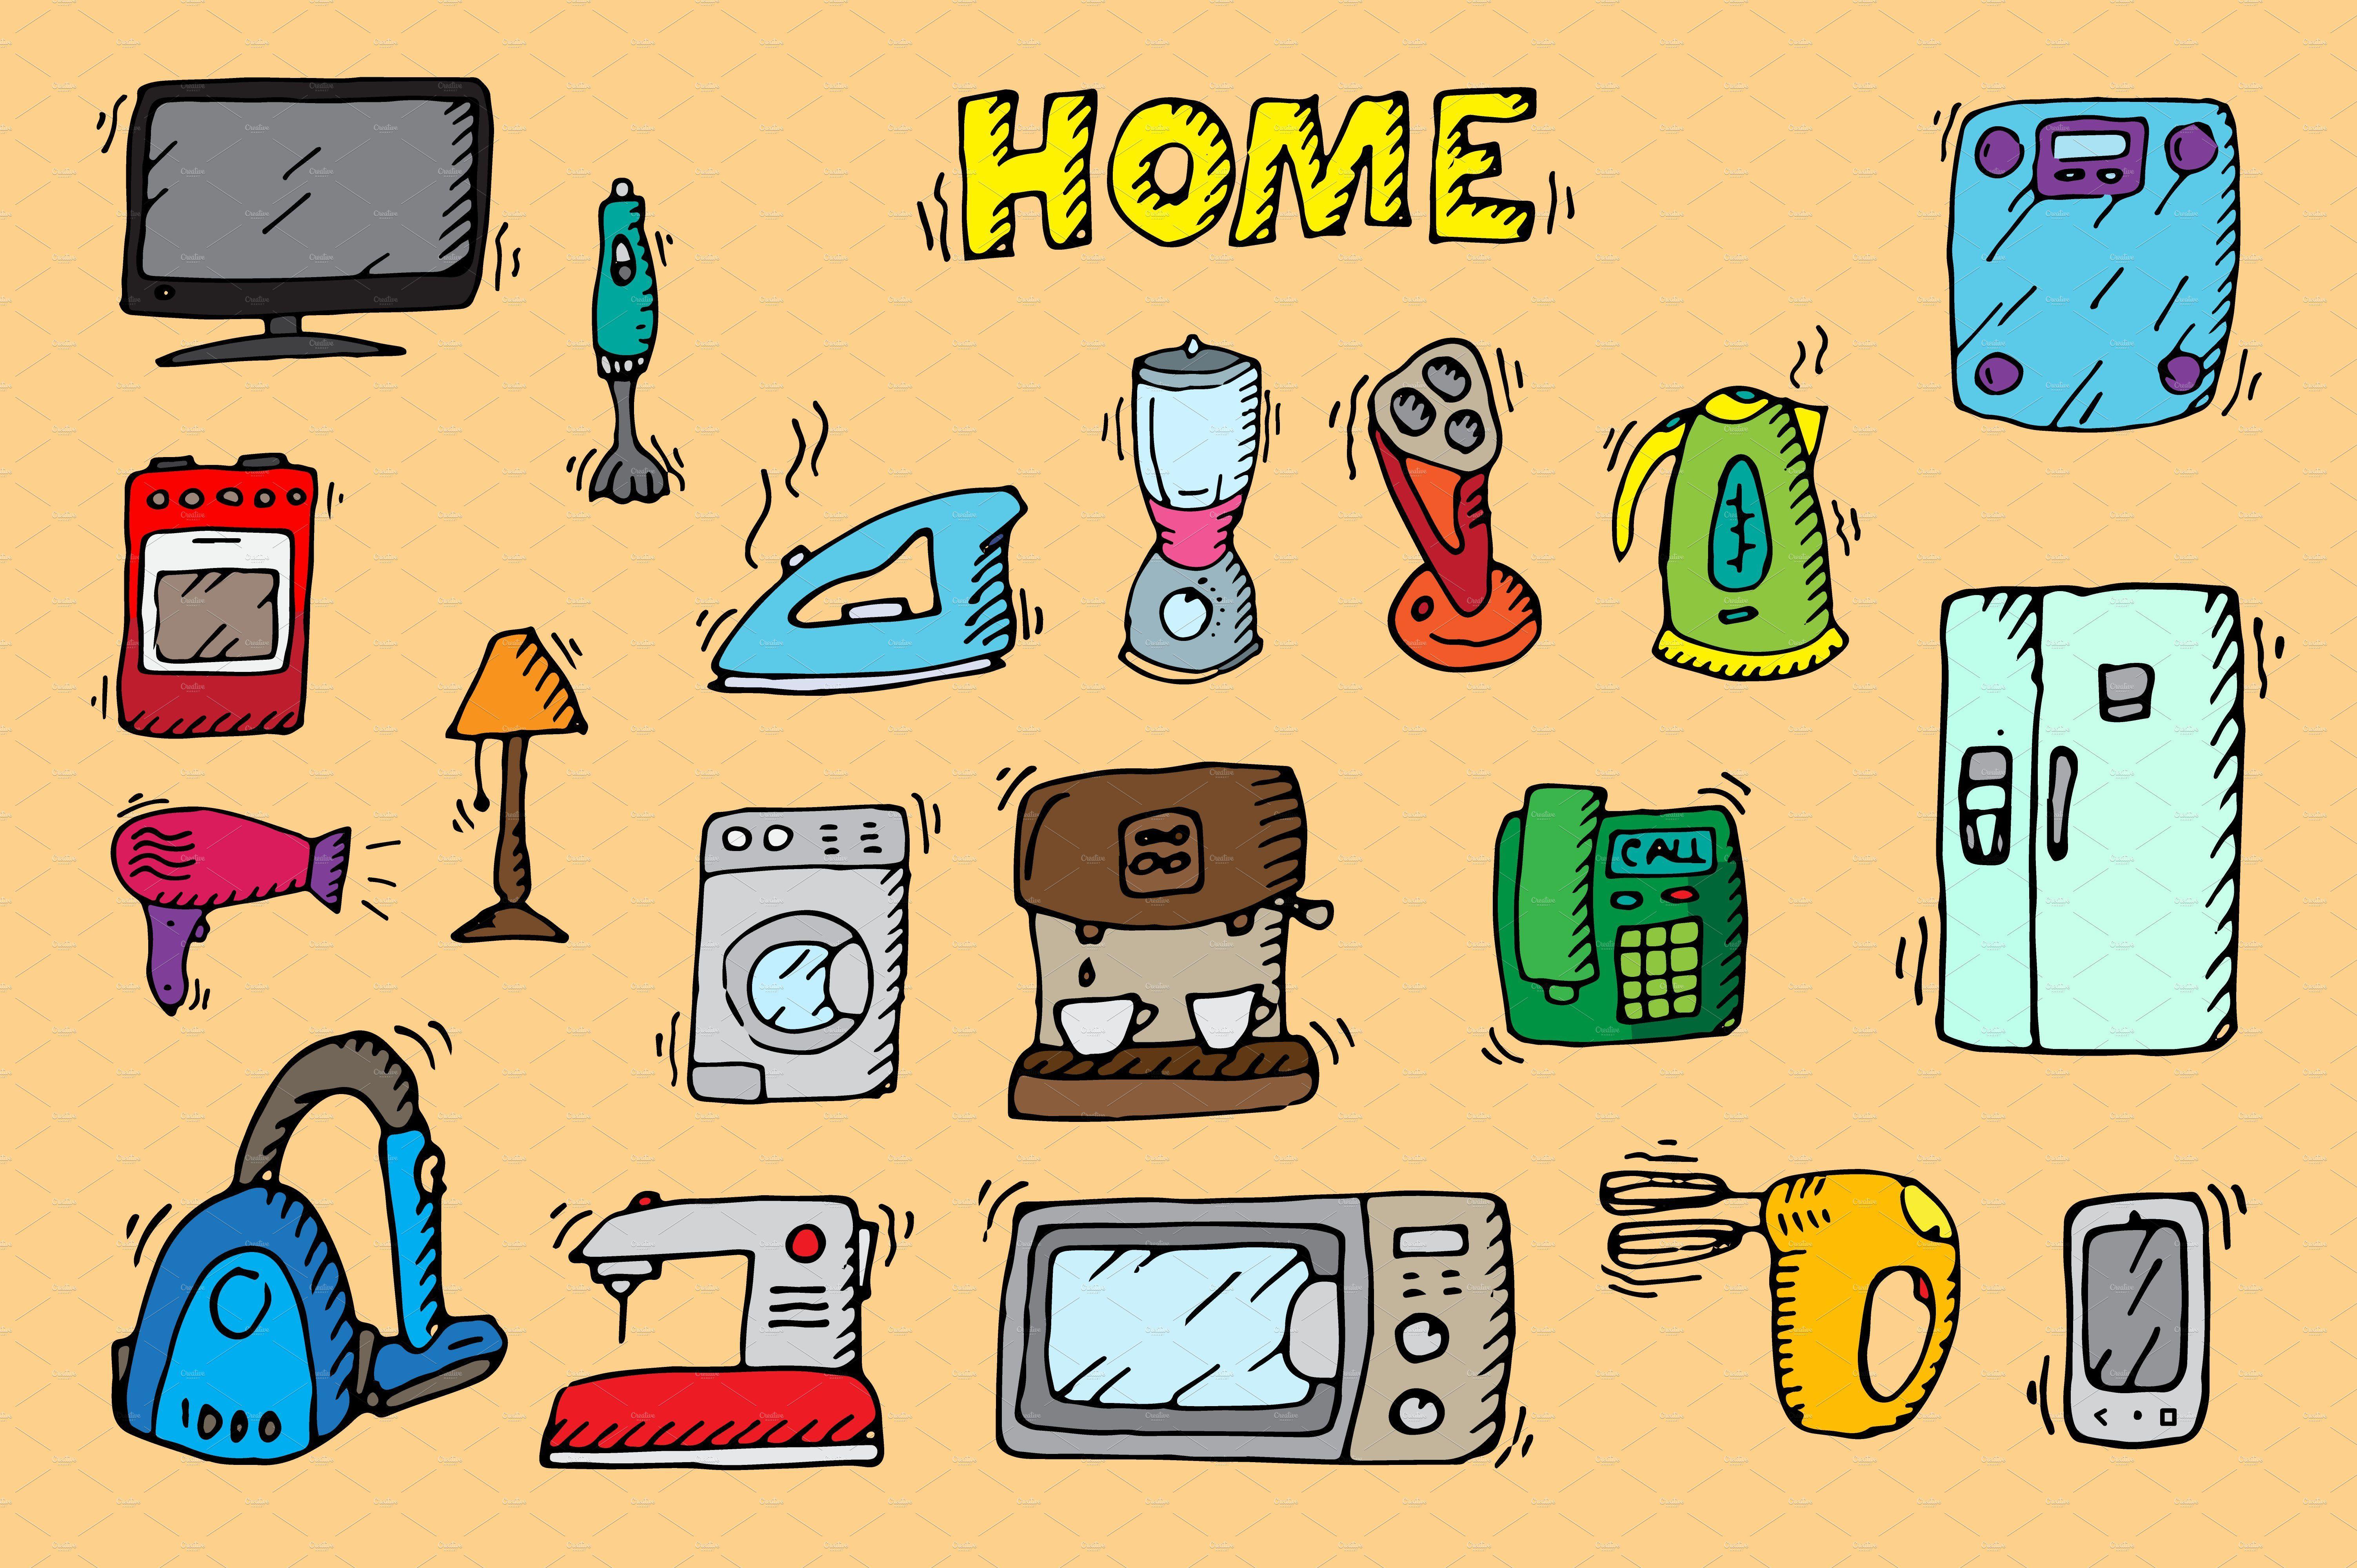 Home Appliances Doodle Vector By Alex Hliv On Creativemarket